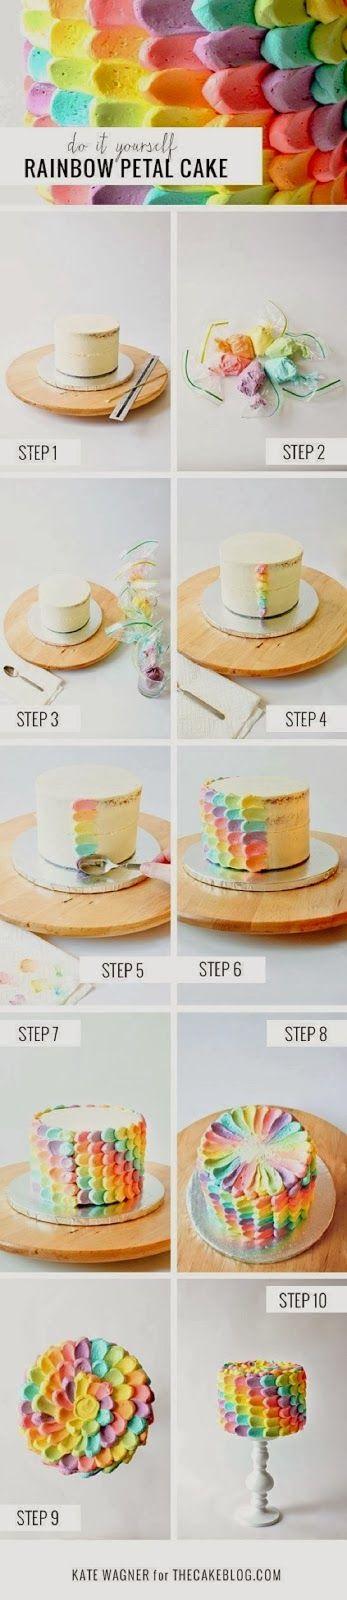 Awesome Food: DIY Rainbow Petal Cake